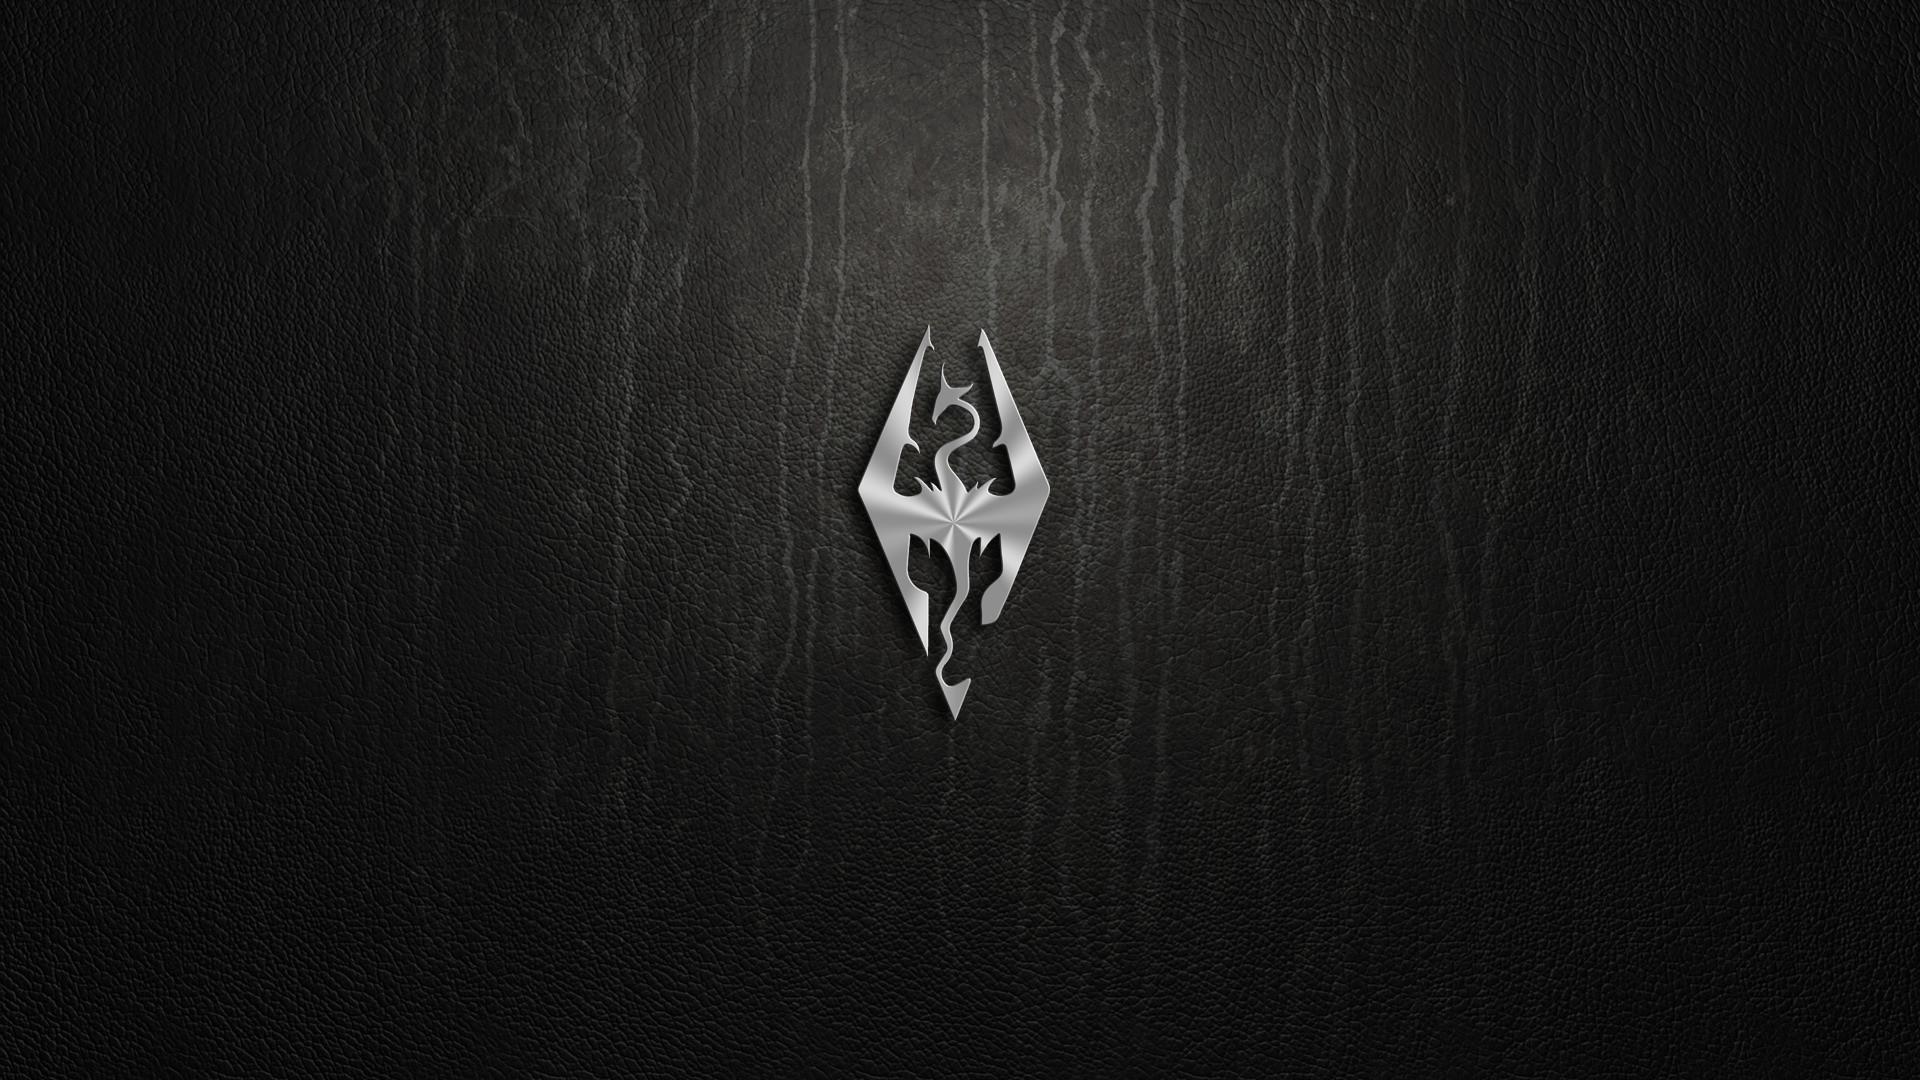 Skyrim Logo Wallpaper 82 Images